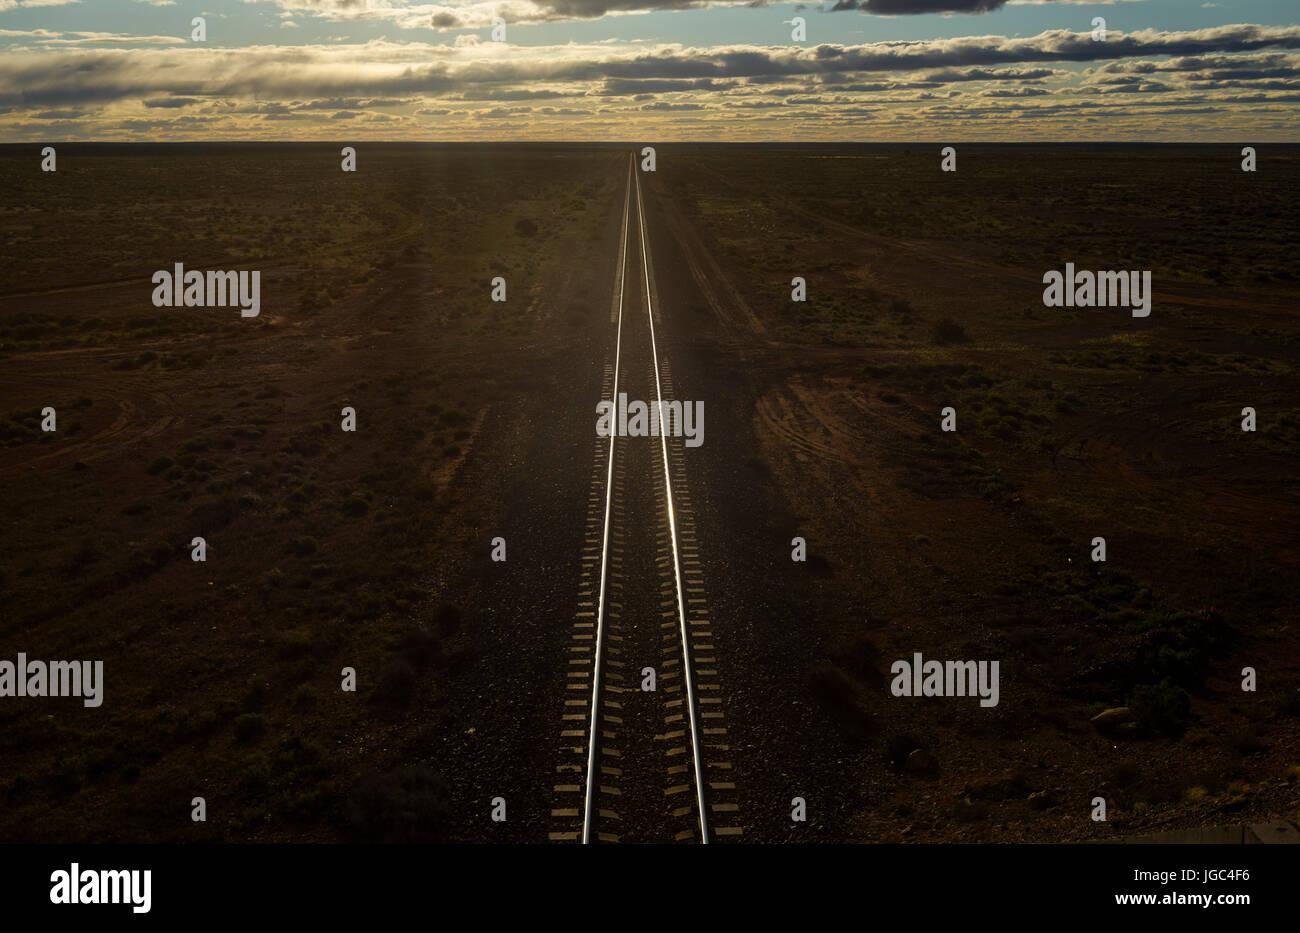 Railroad track in Outback, Australia - Stock Image